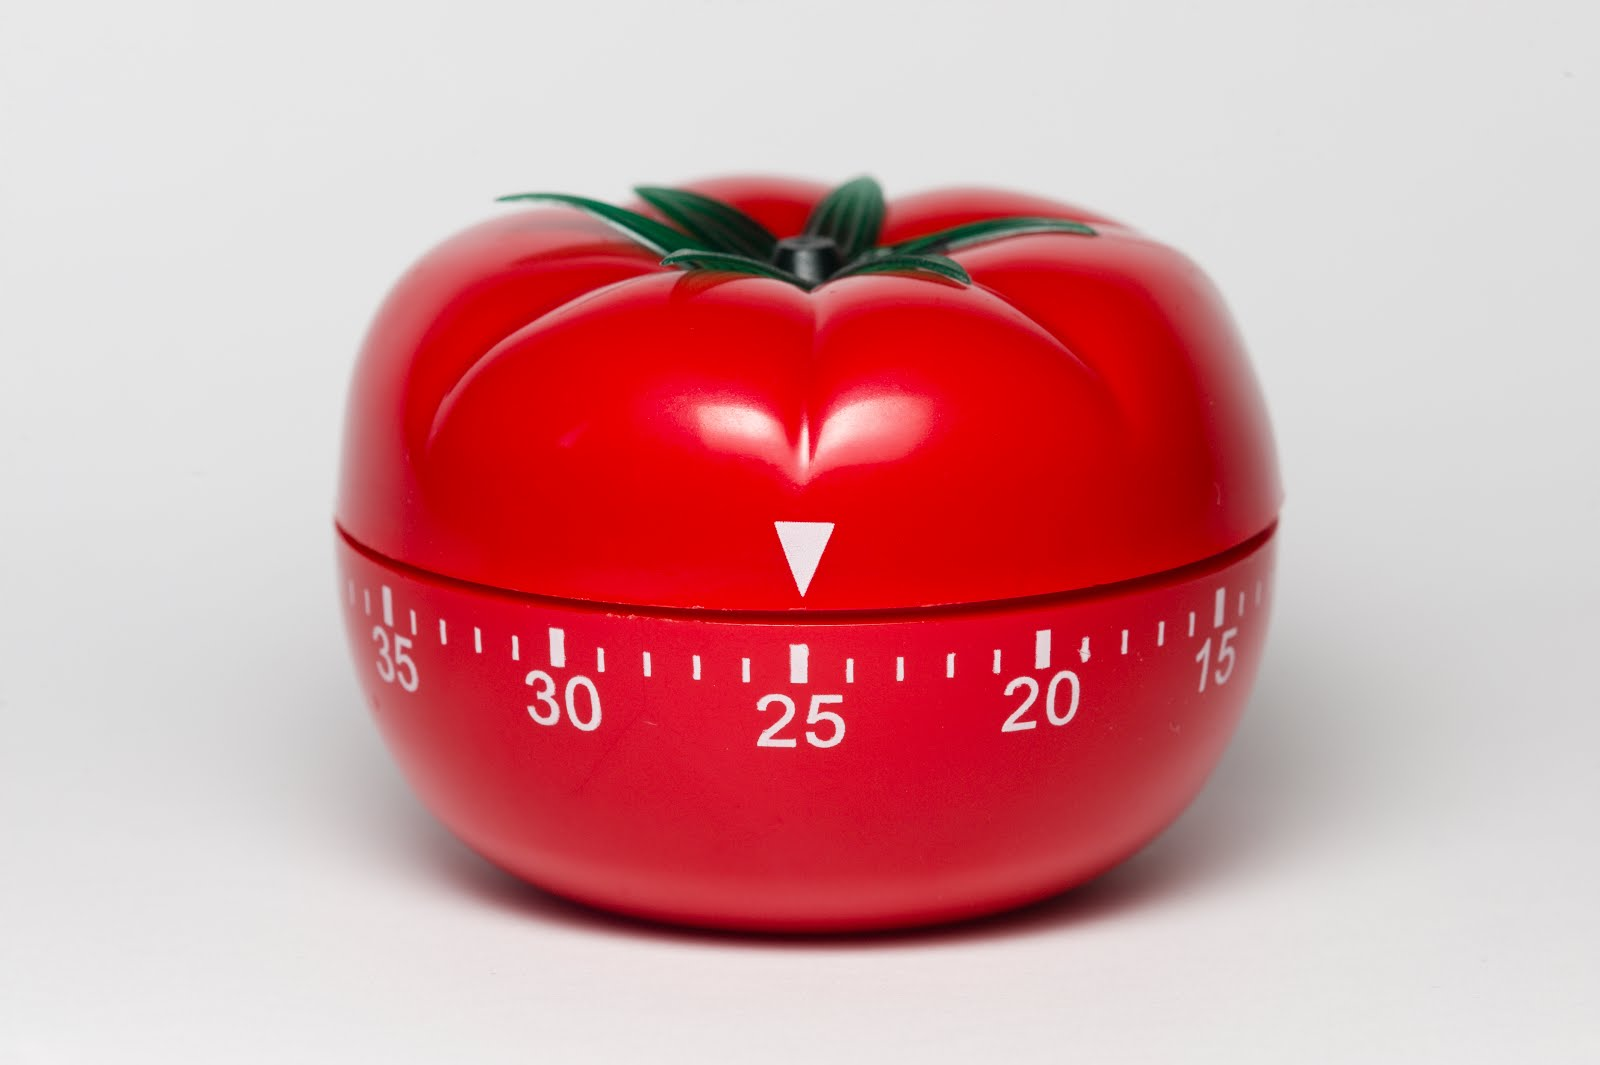 teknik pomodoro, meningkatkan konsentrasi, multitasking, artikel pengembangan diri, pomodoro